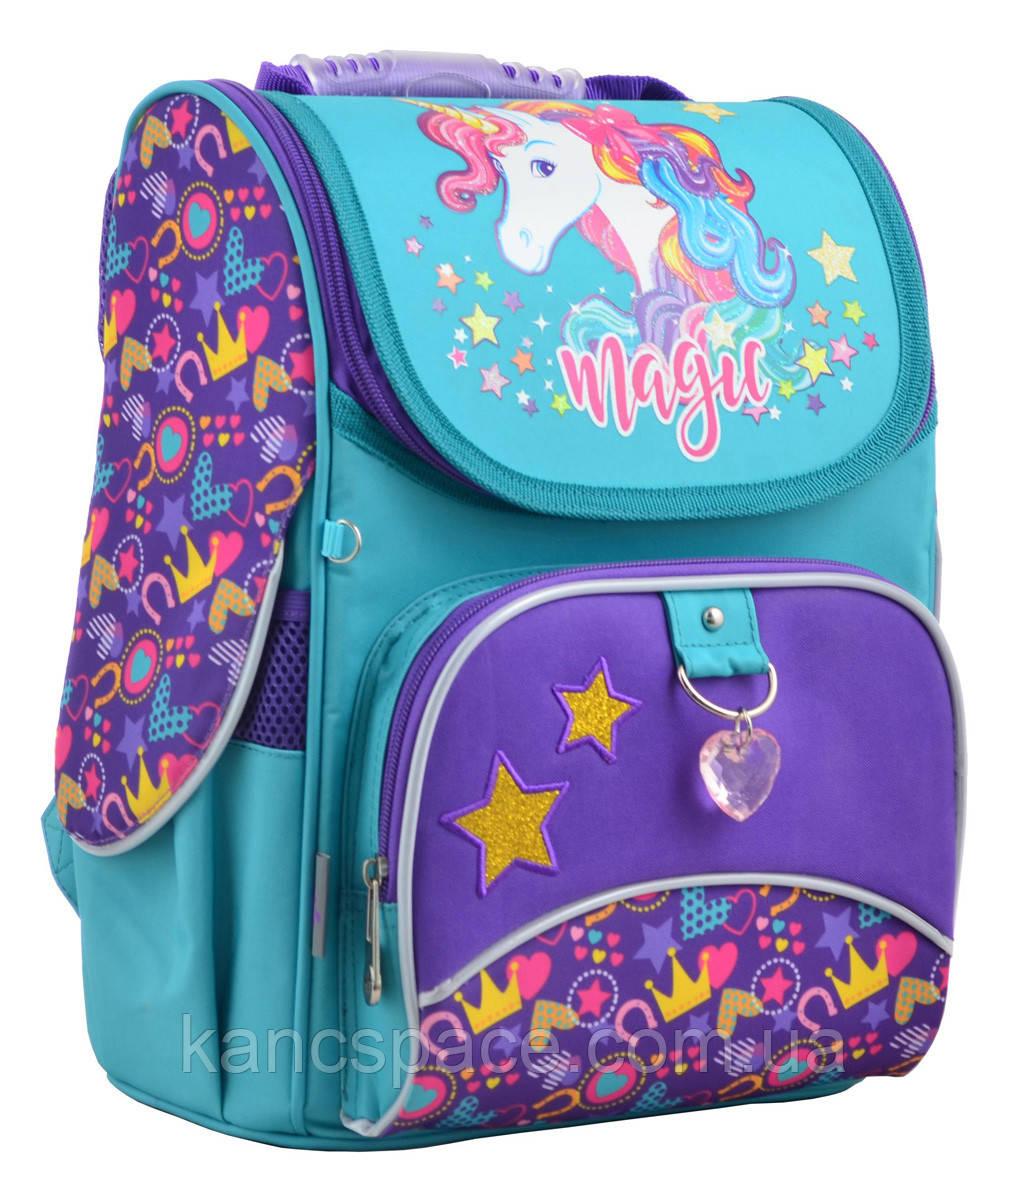 Рюкзак каркасний H-11 Unicorn, 33.5*26*13.5